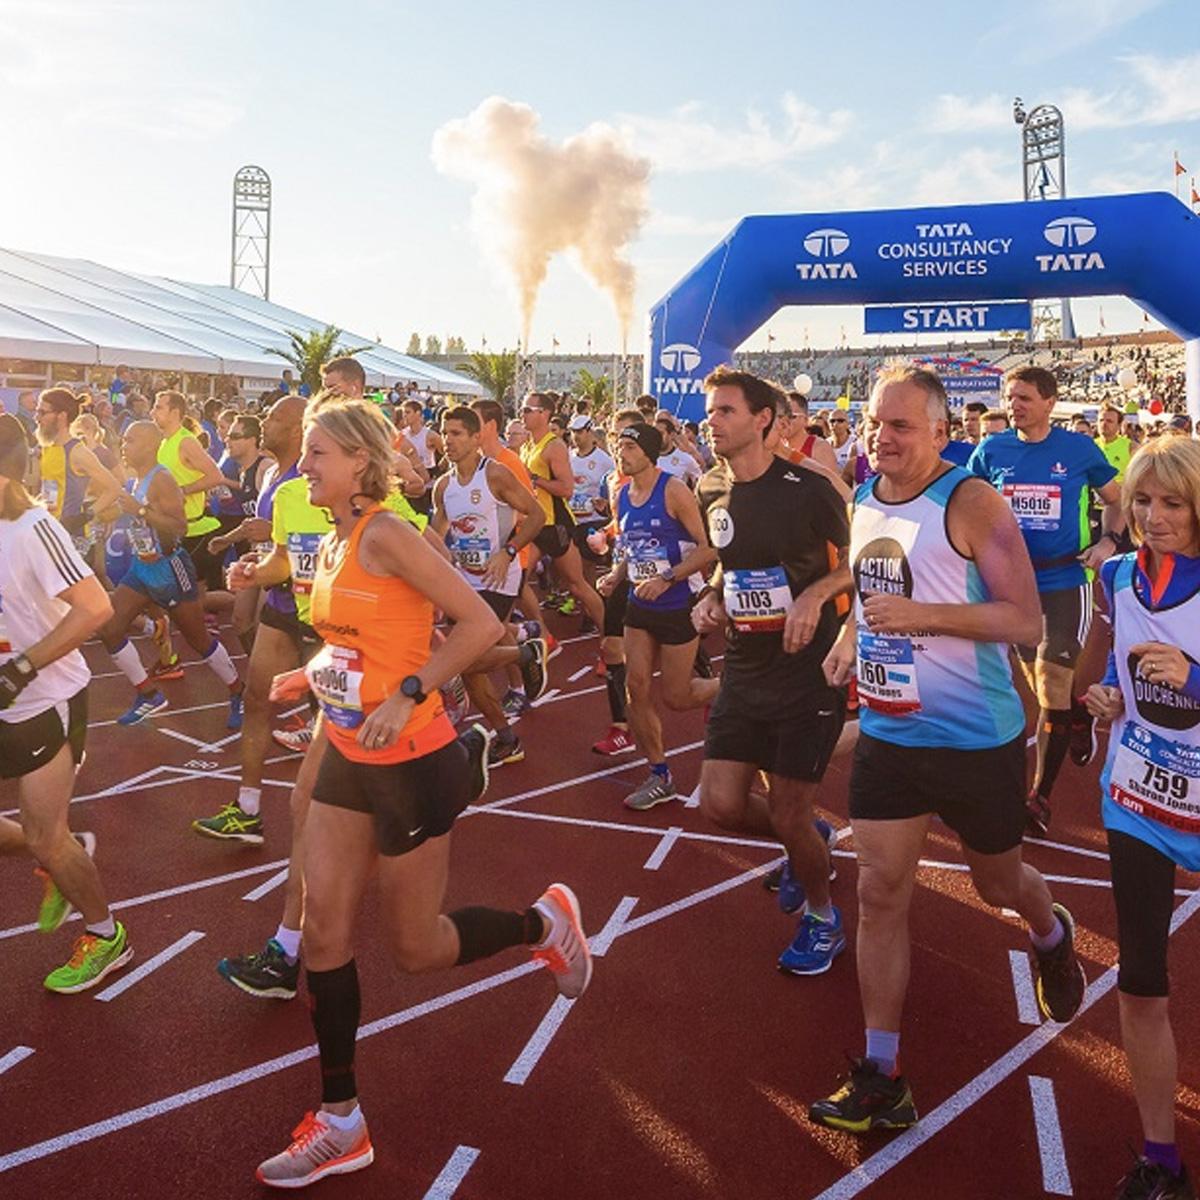 TCS Amsterdam marathon startbewijs